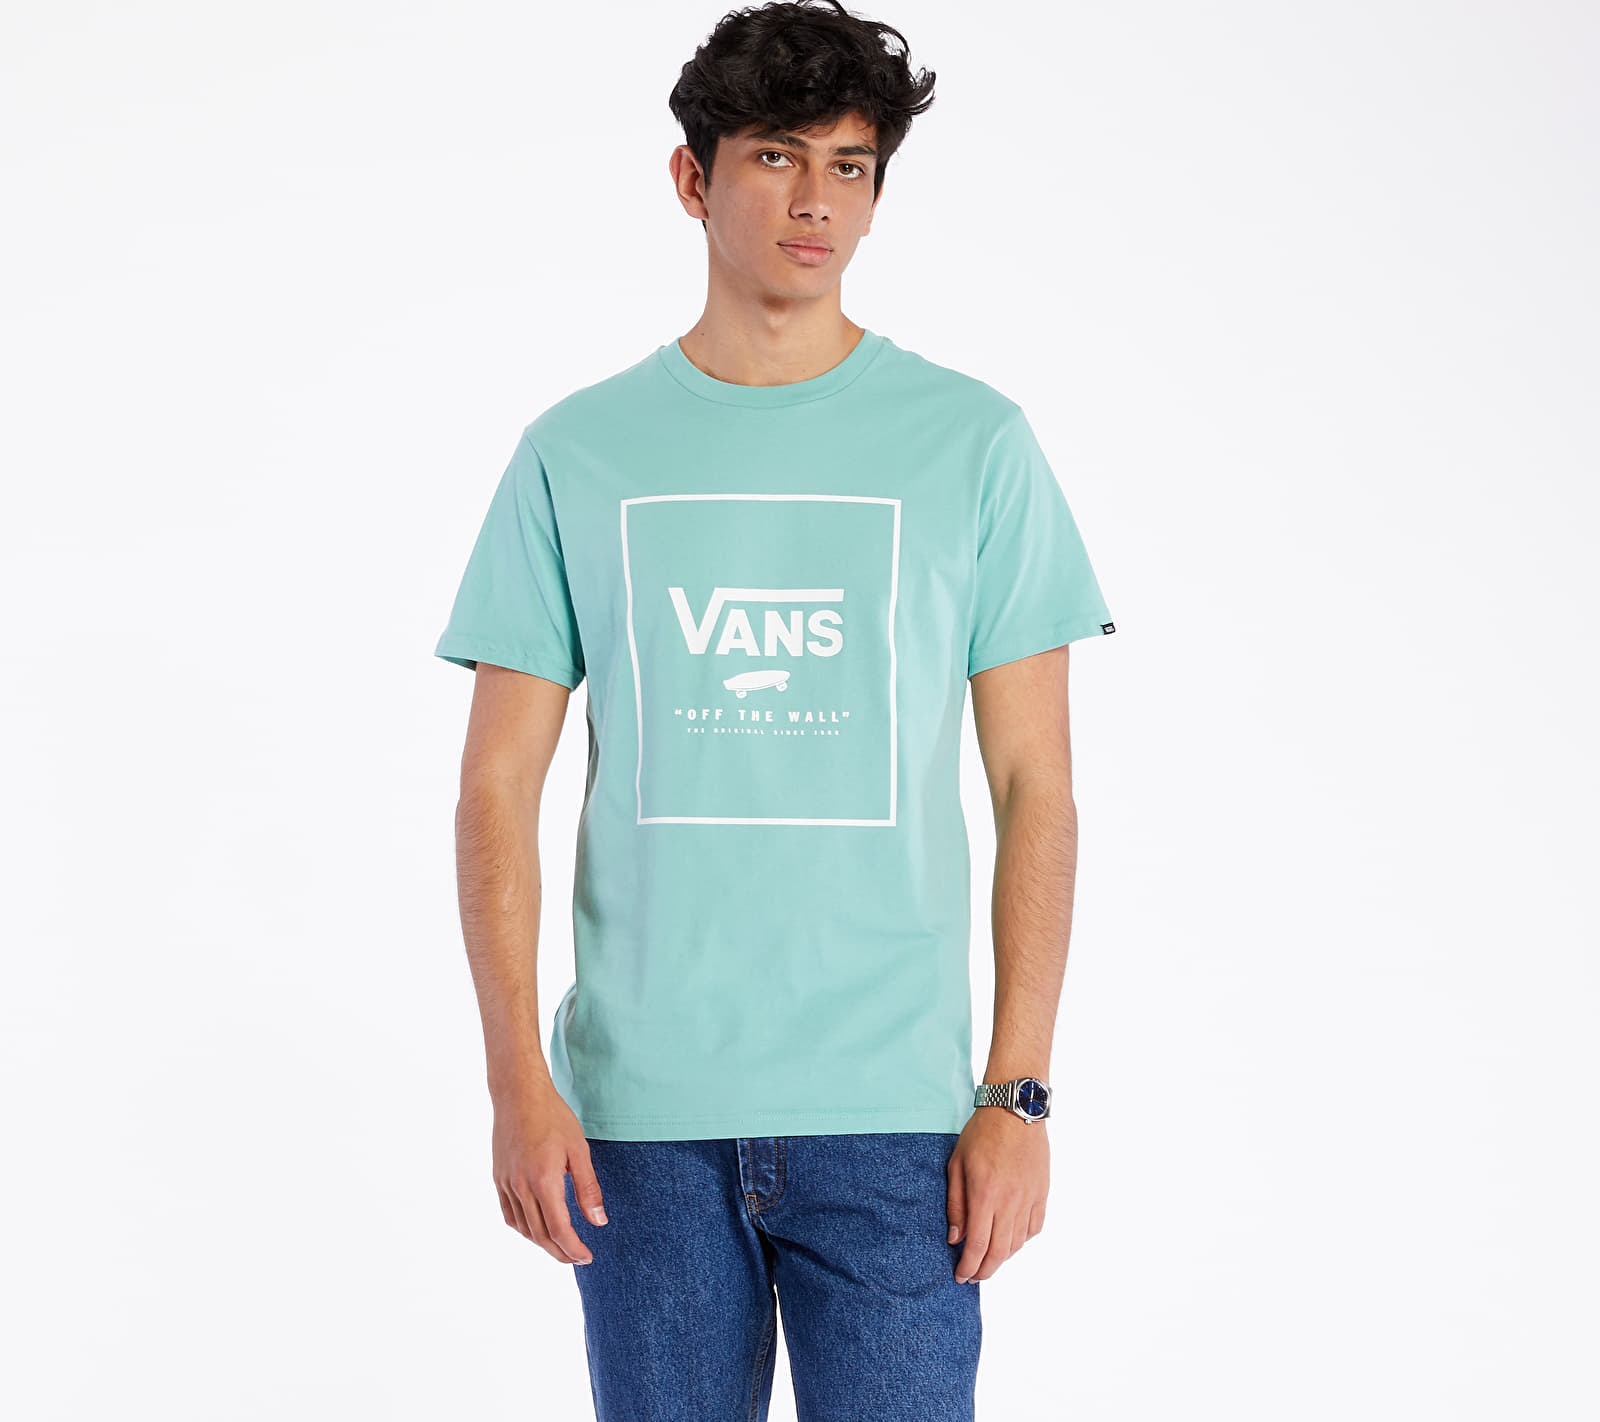 Vans Print Tee Canton/ White M